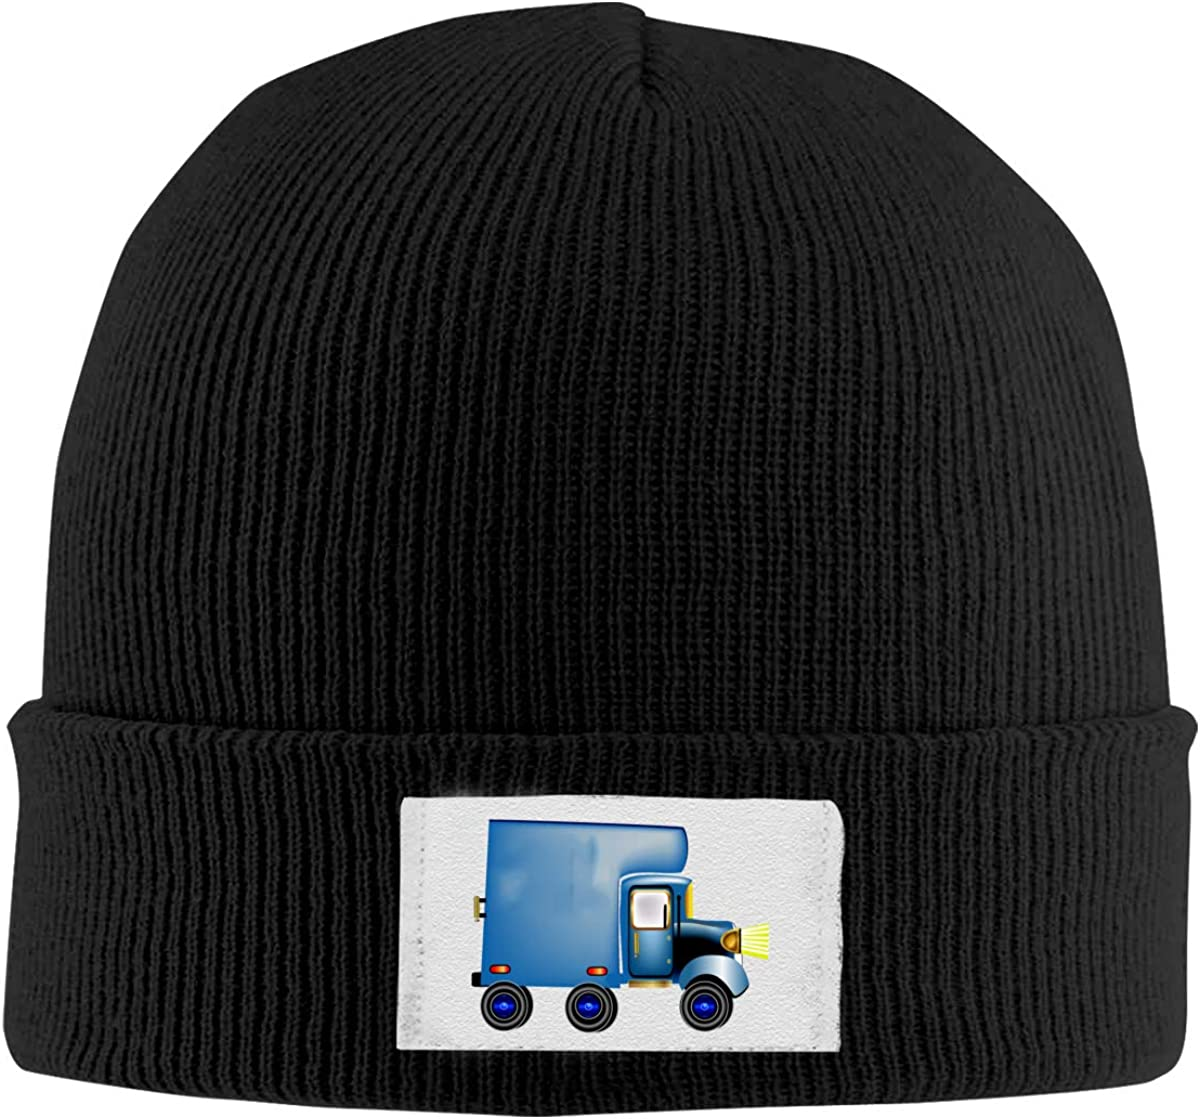 Blue Moving Car Knit Hats Beanies Cap Cool Unisex Winter